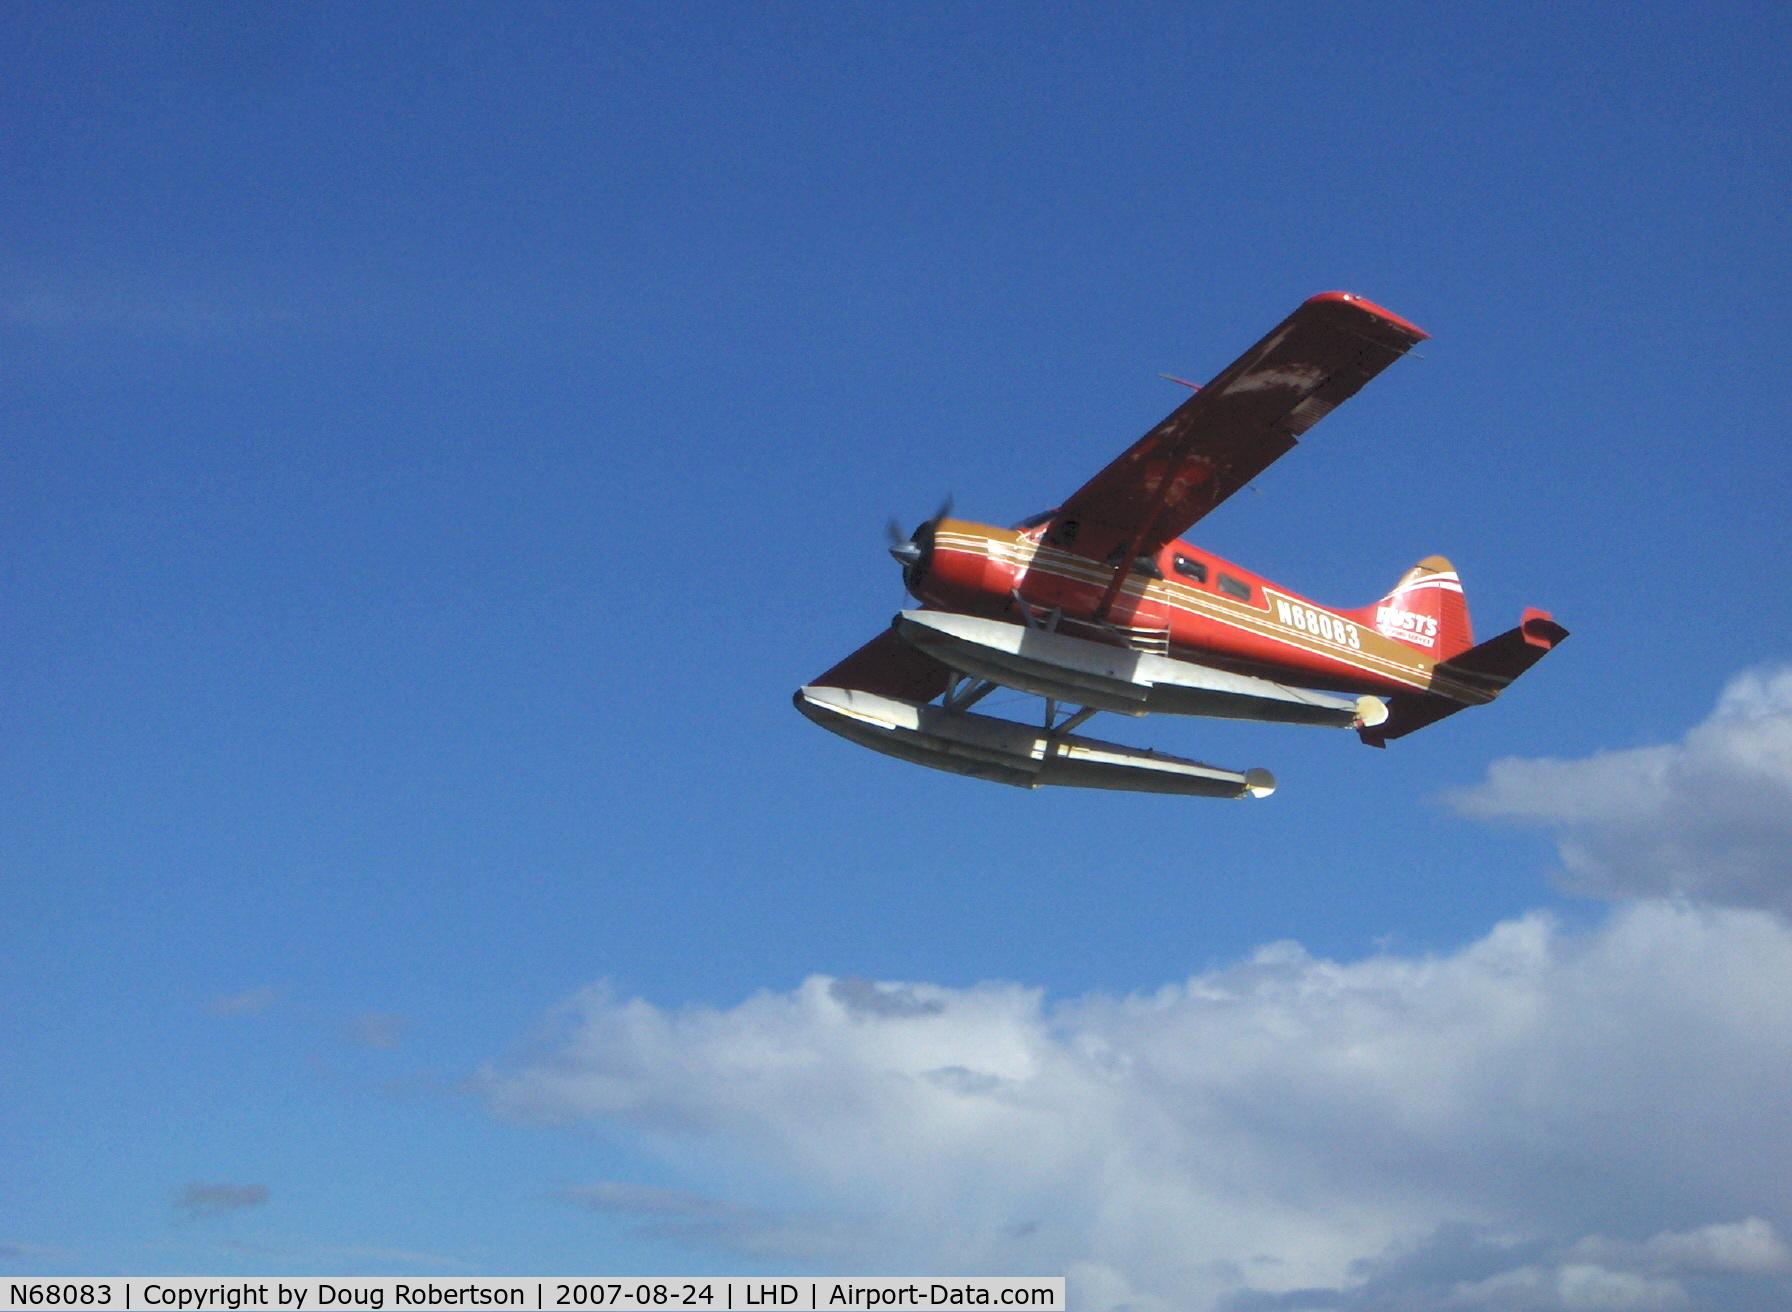 N68083, 1958 De Havilland Canada DHC-2 Beaver Mk.I C/N 1254, 1958 DeHavilland BEAVER DHC-2 Mk.1, P&W R-985 450 Hp, of Rust Air, Multiple certification, takeoff climb